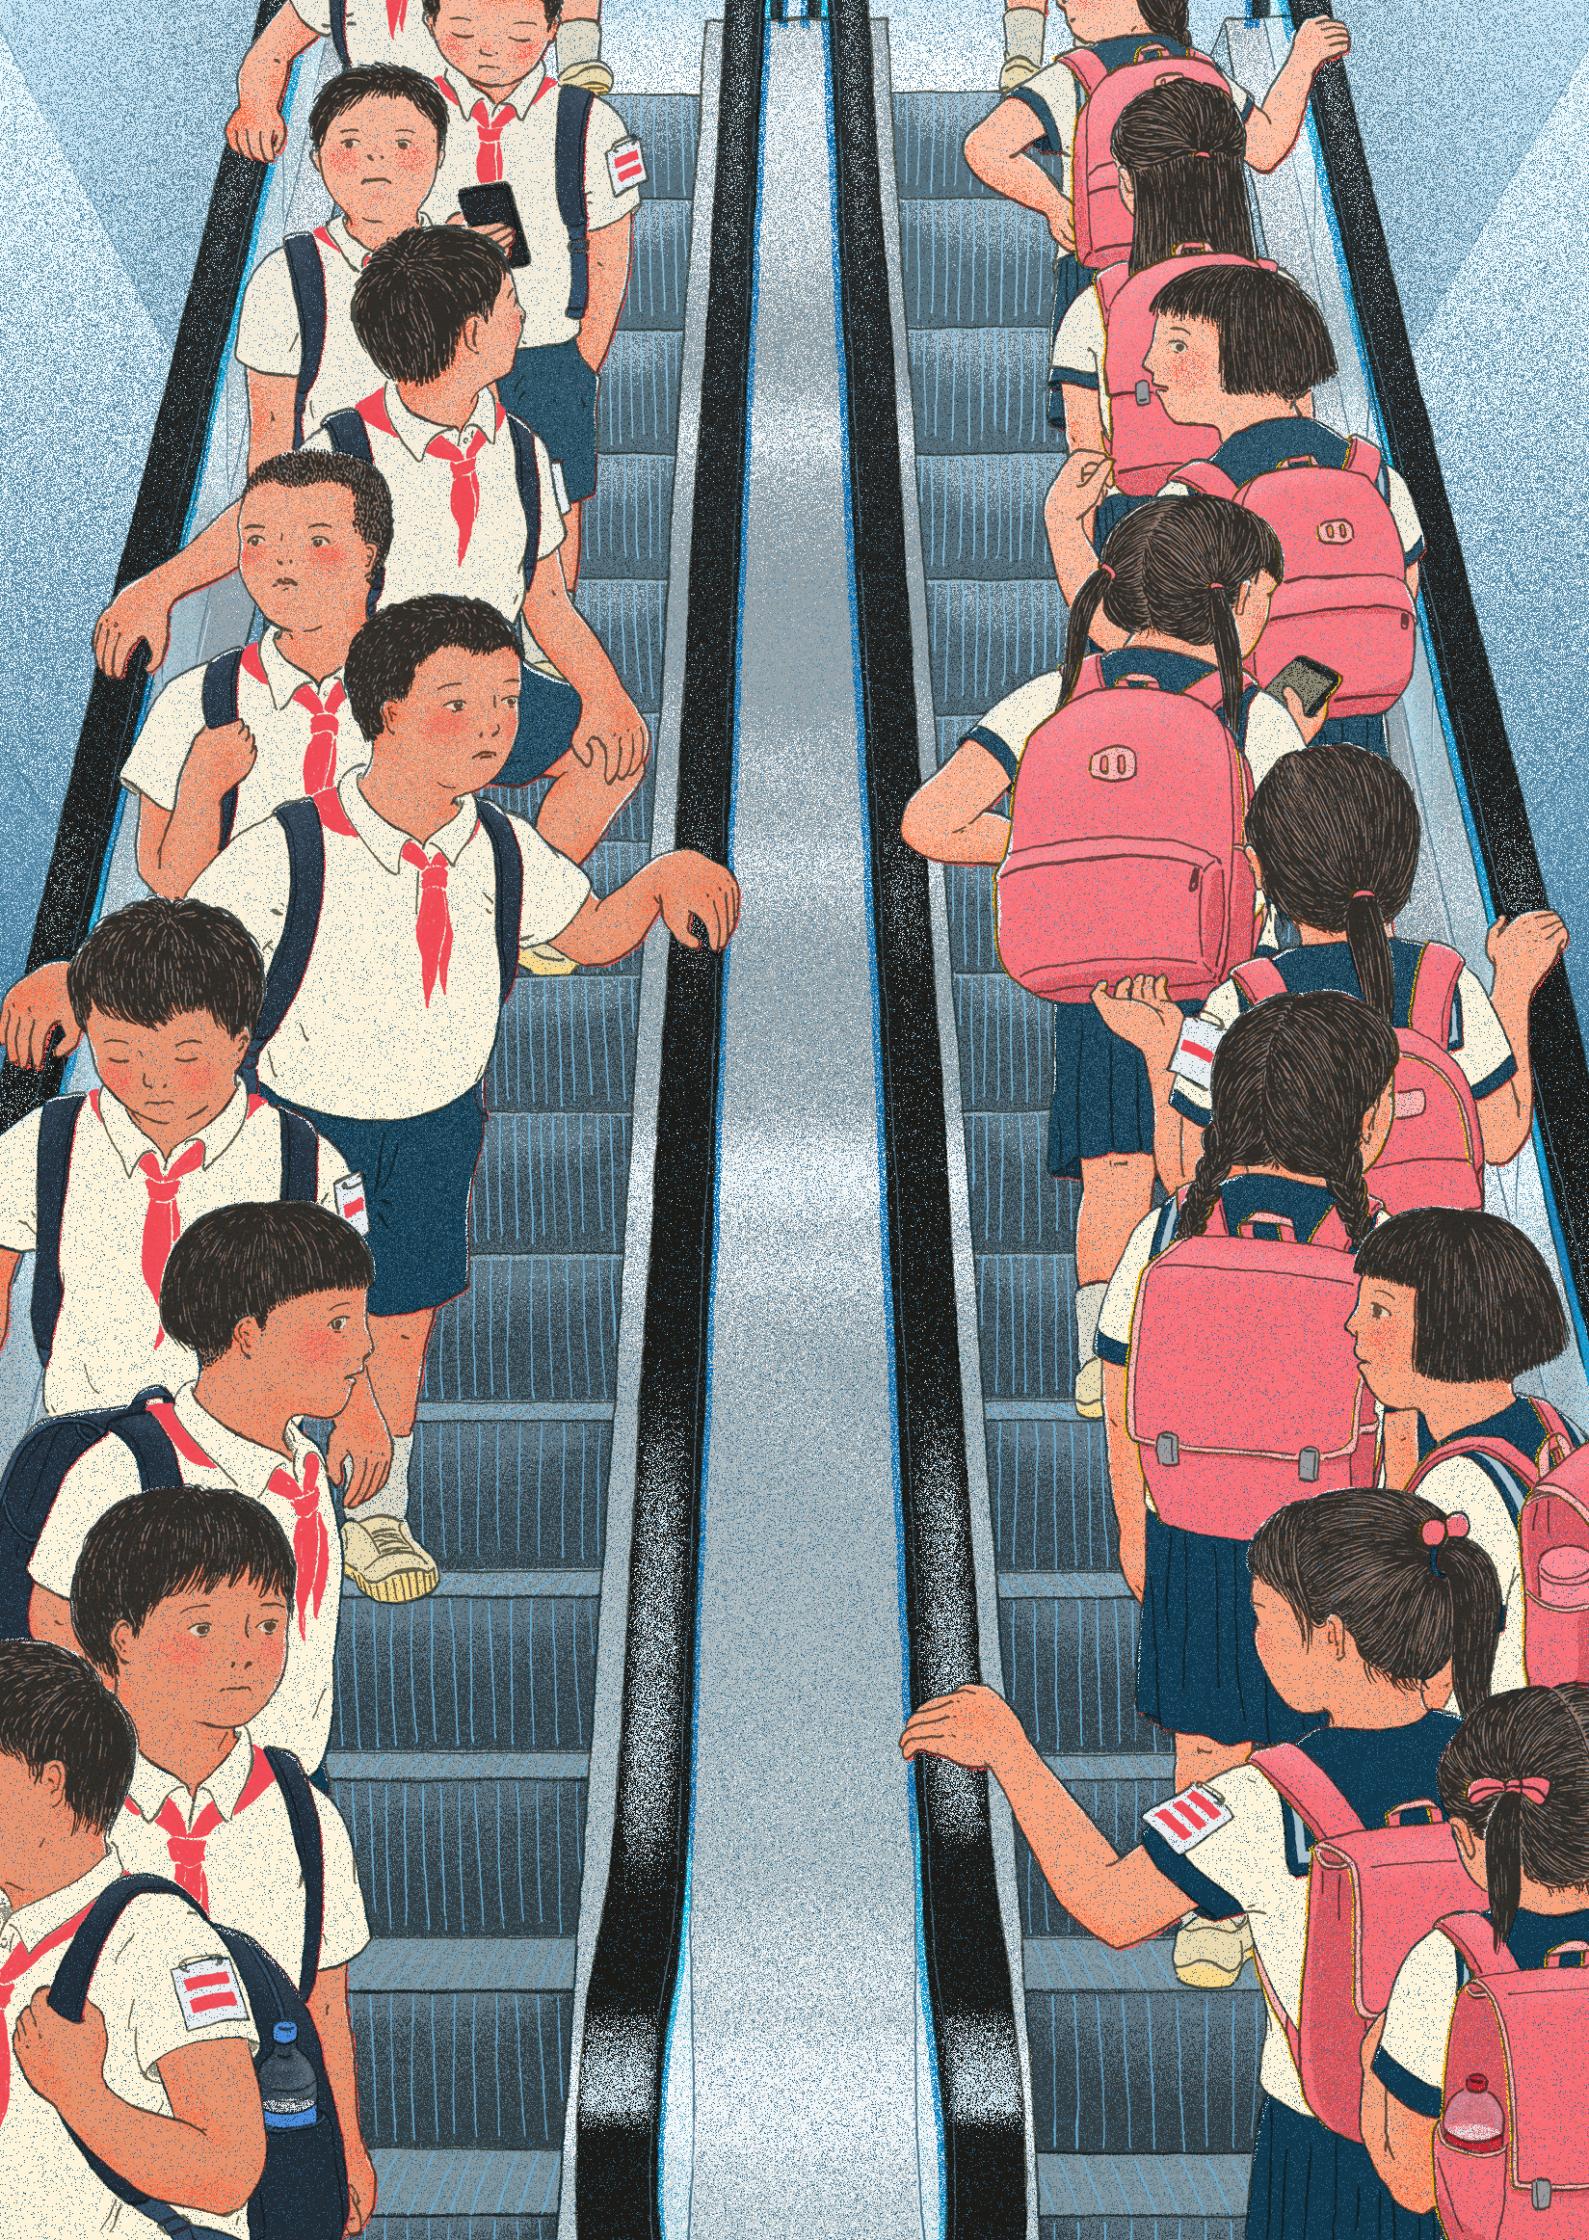 202000_Model Citizen Guidelines_9 escalator final.jpg